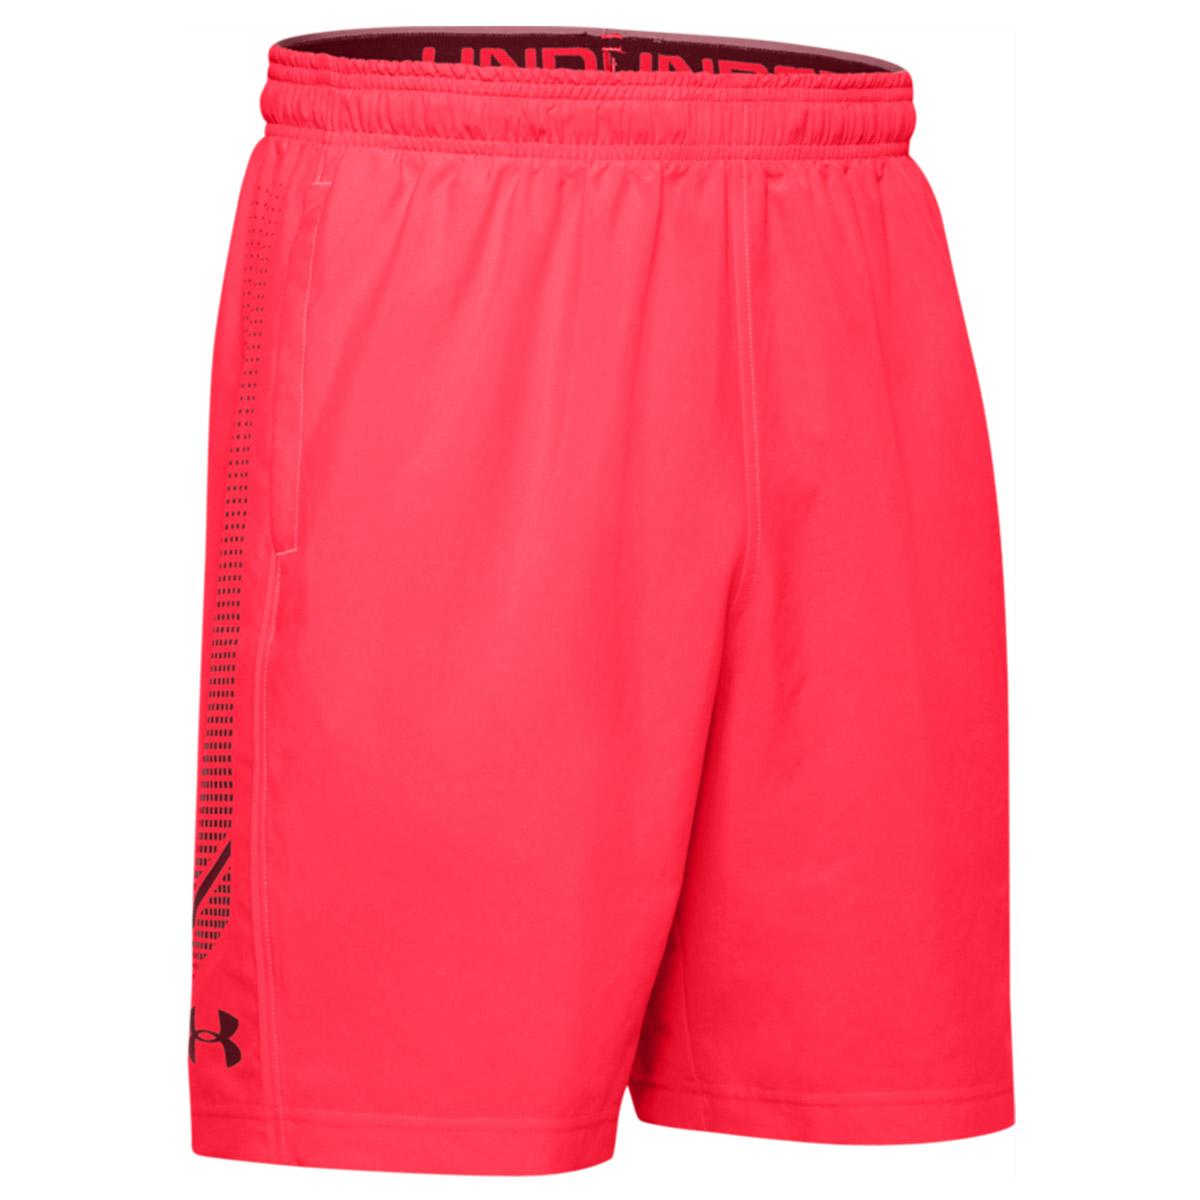 Under-Armour-Homme-2020-Tisse-graphique-Leger-Respirable-Wicking-Shorts miniature 10